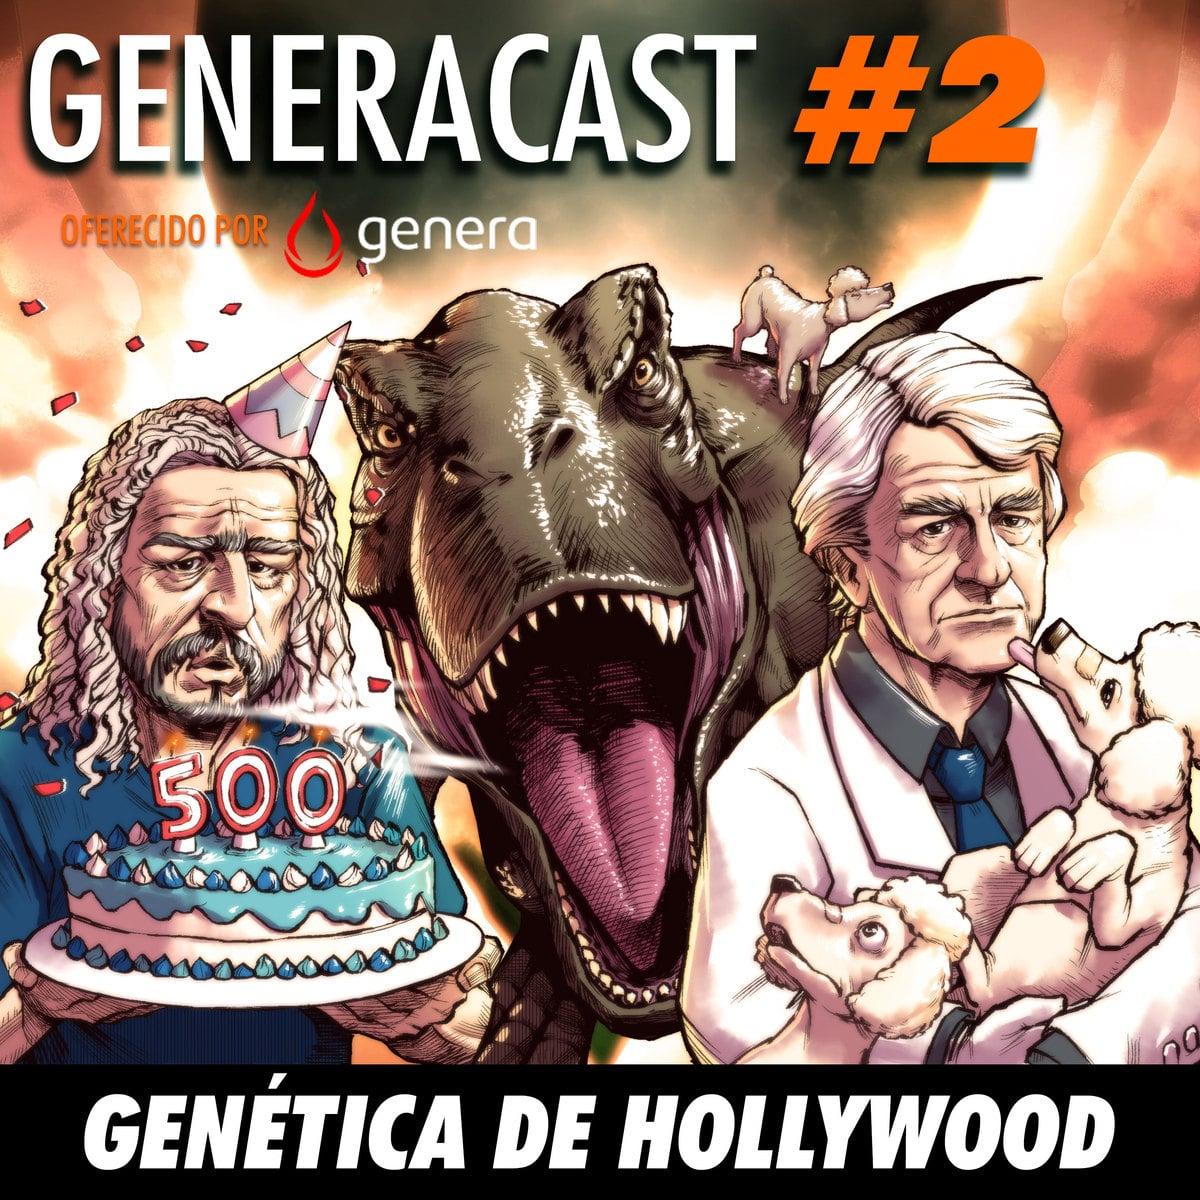 NerdCast Generacast 02 - Genética de Hollywood